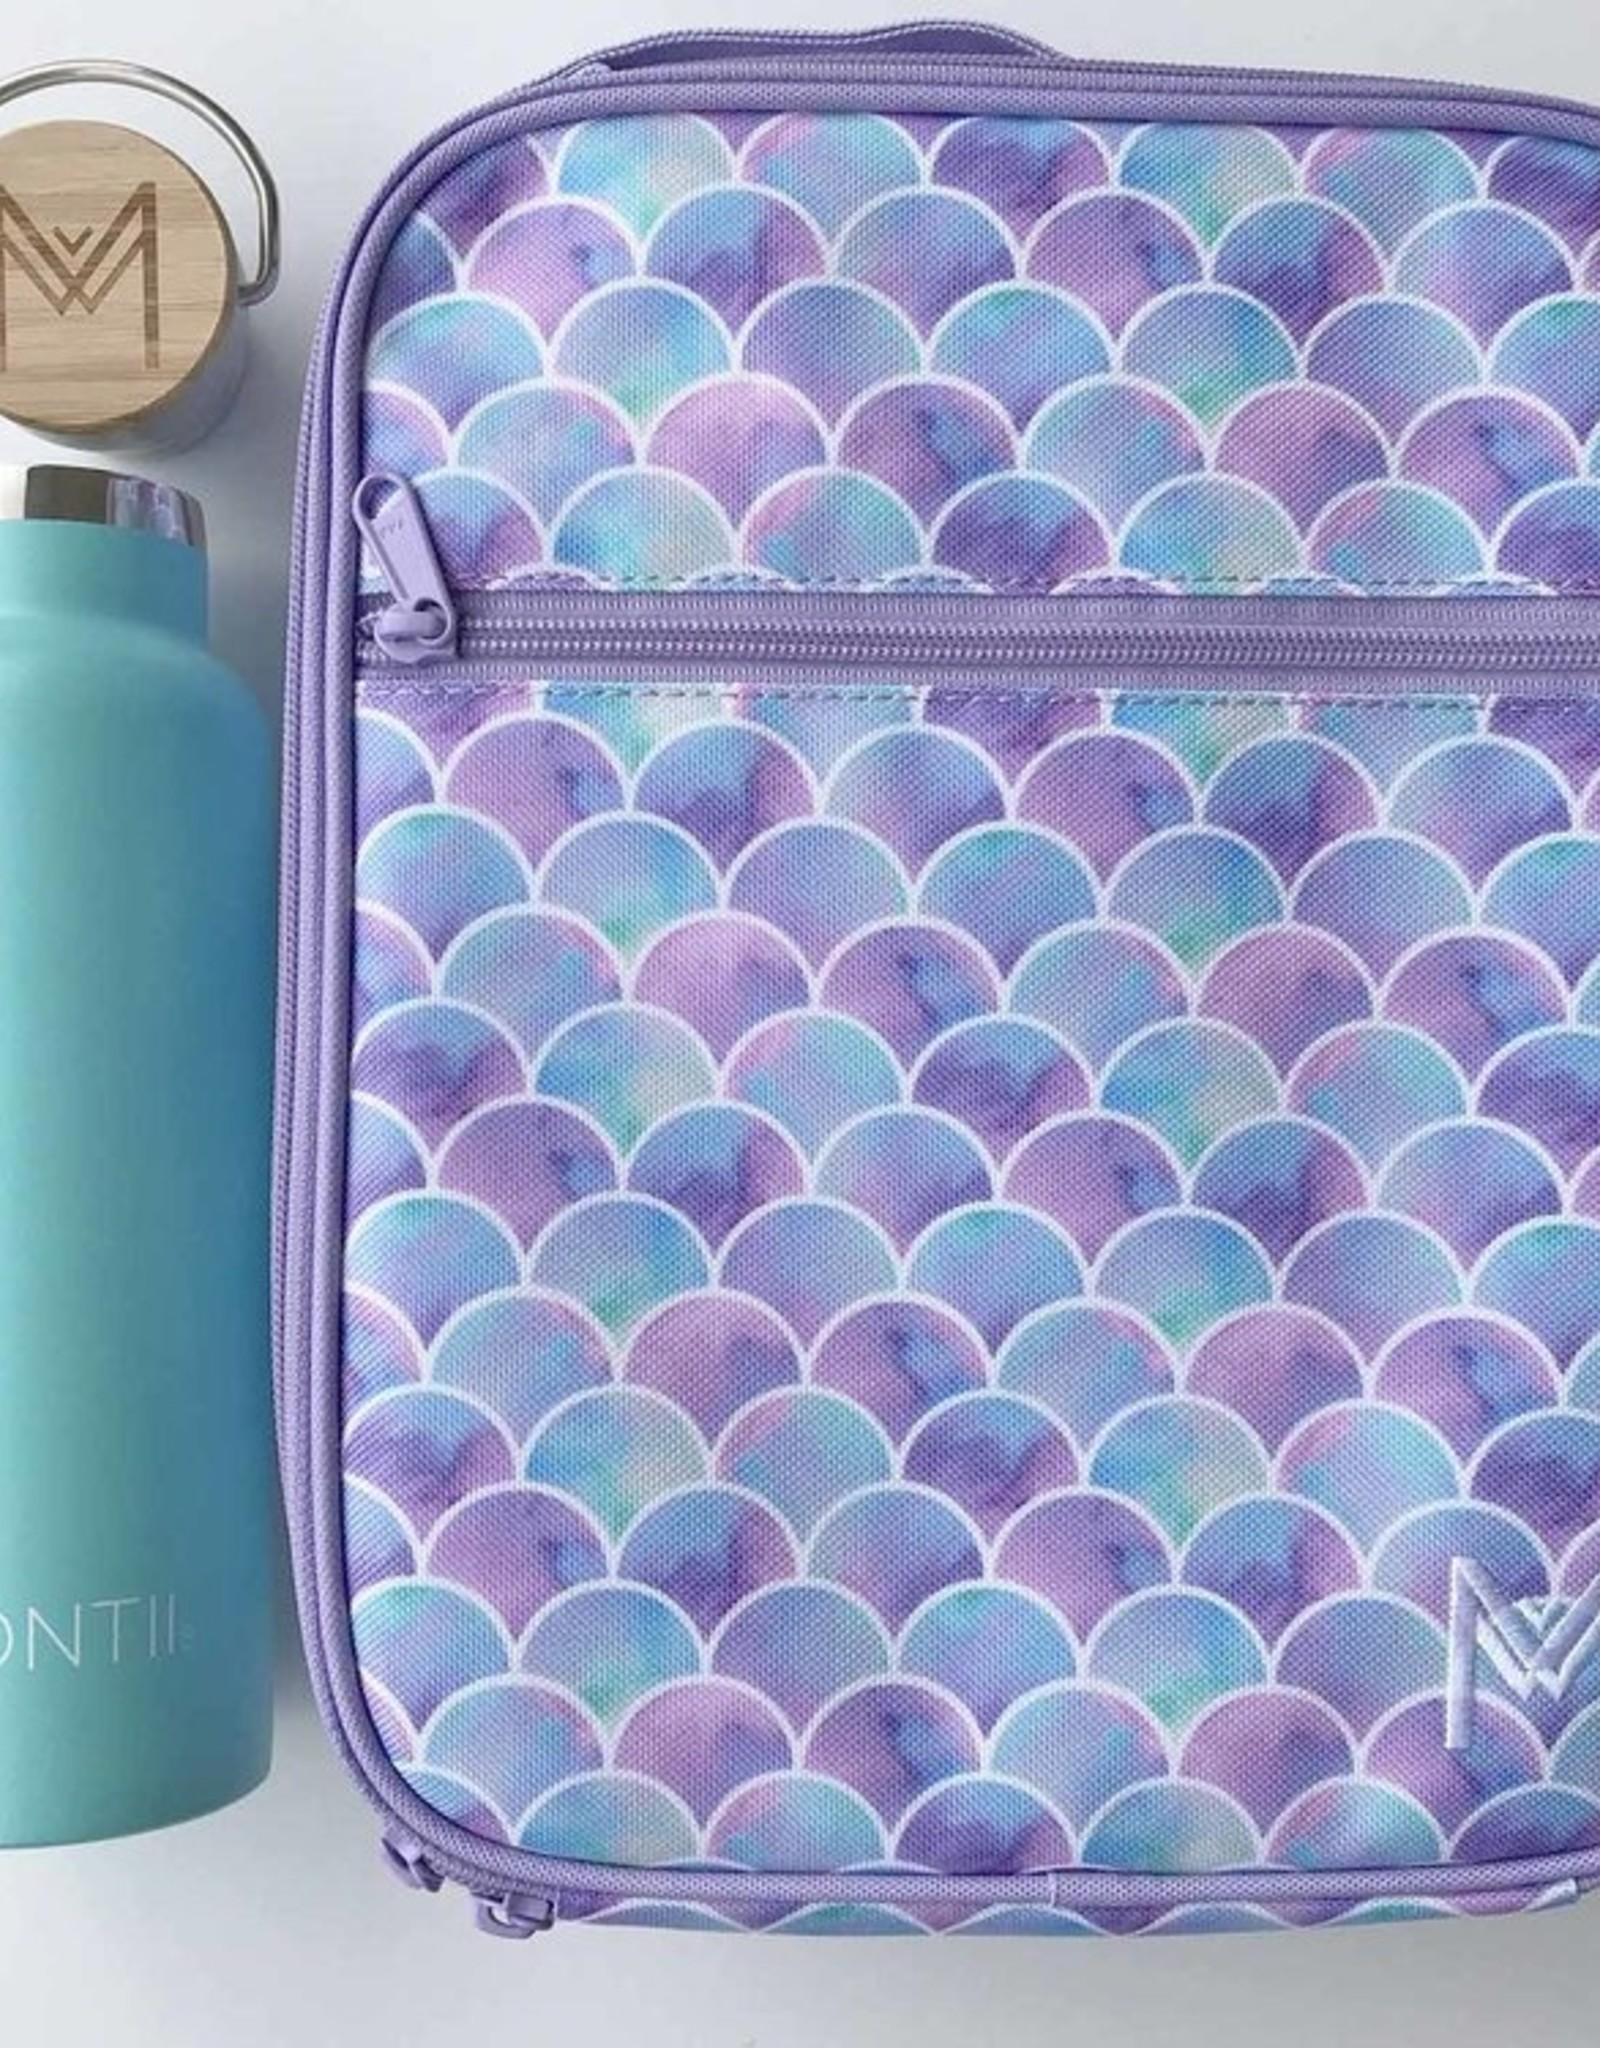 Montii Lunchtas mermaid (inclusief ice pack)